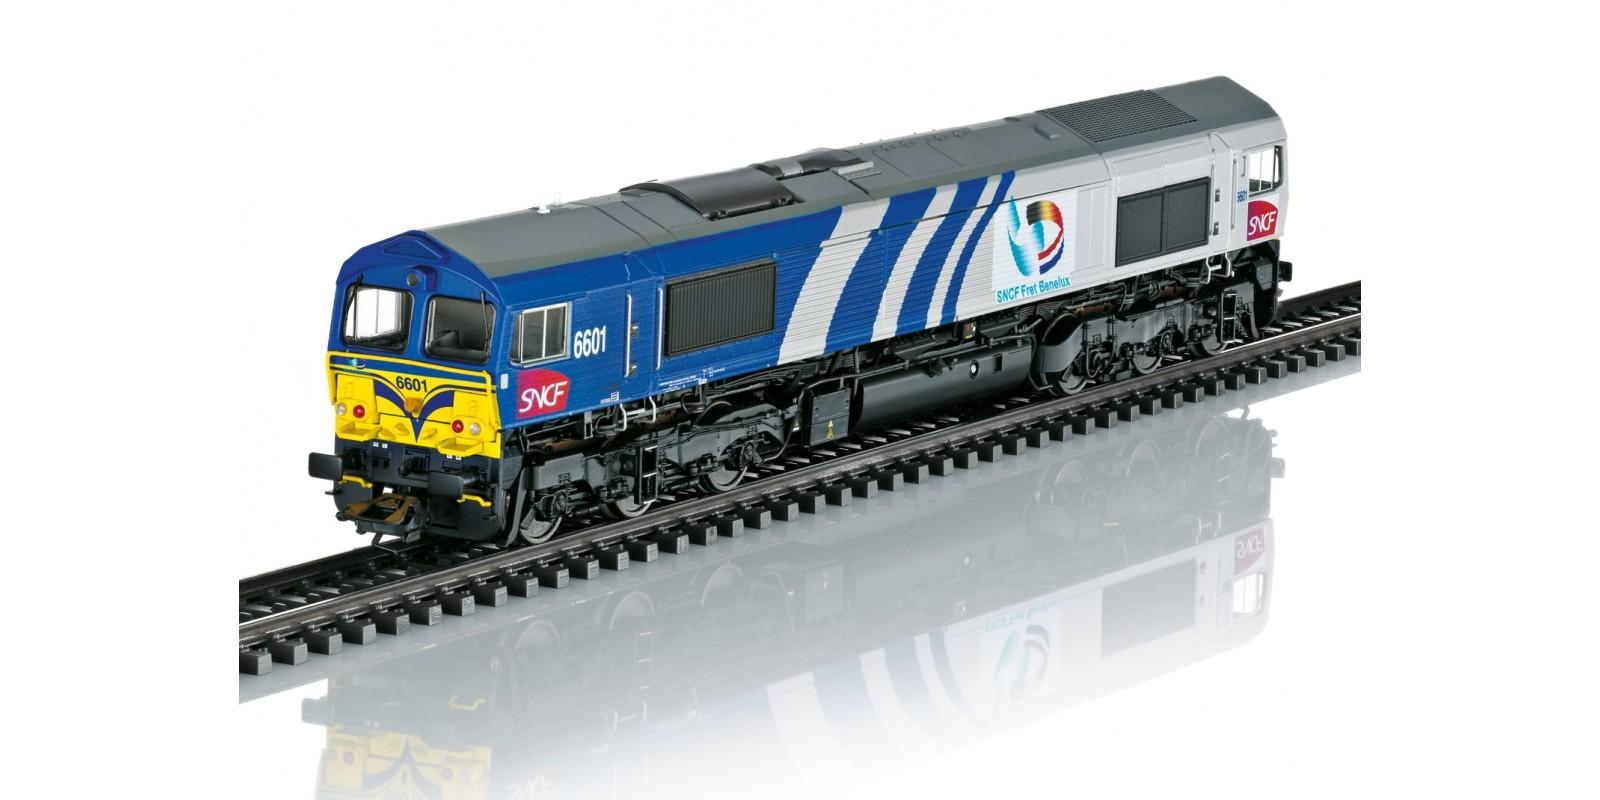 39064 Class 66 Diesel Locomotive